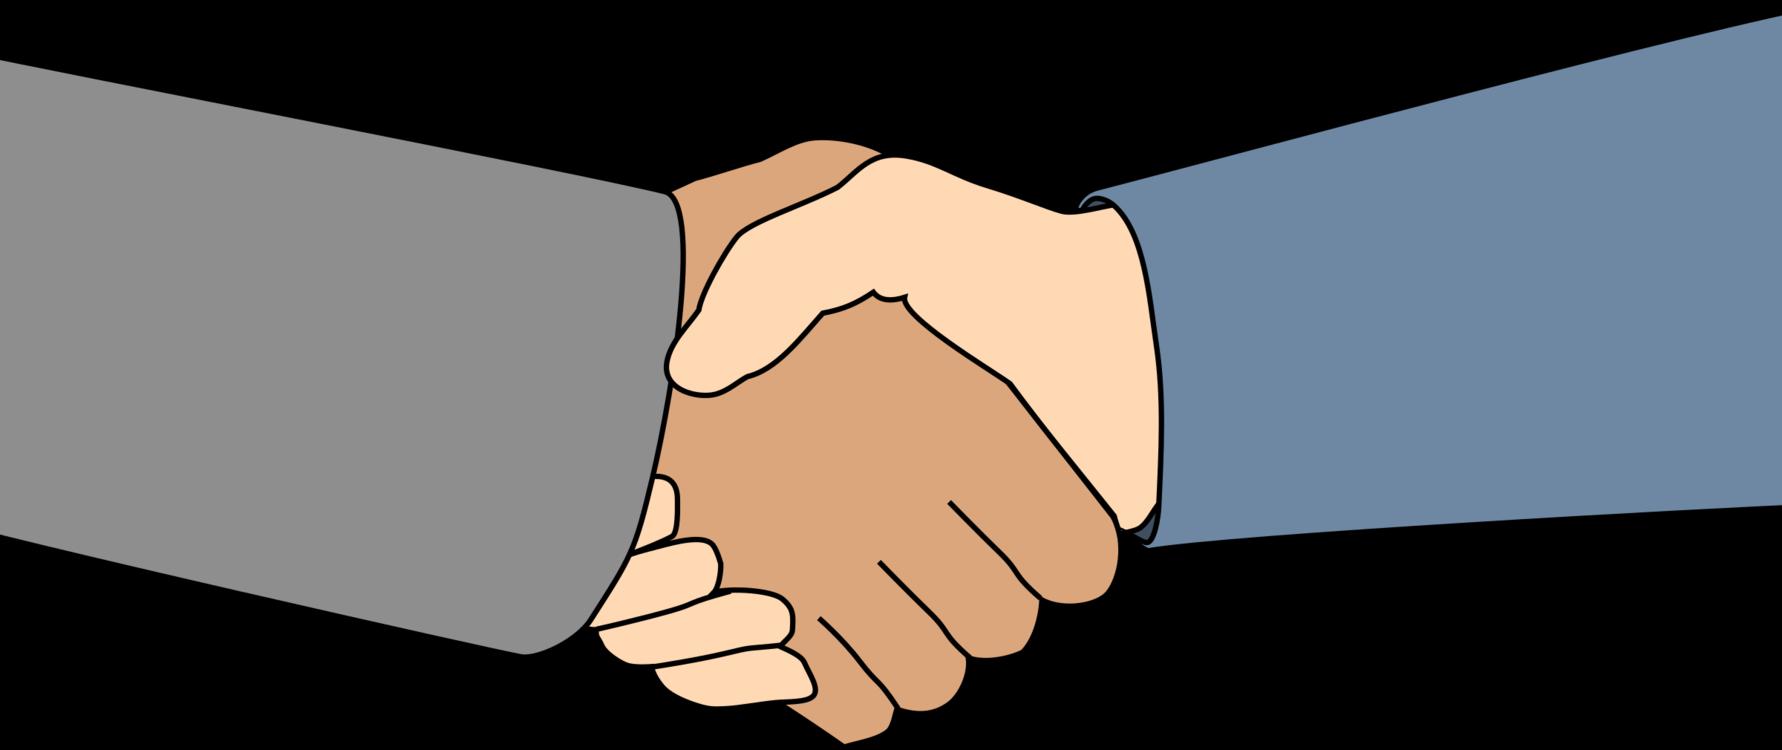 Handshake,Angle,Thumb